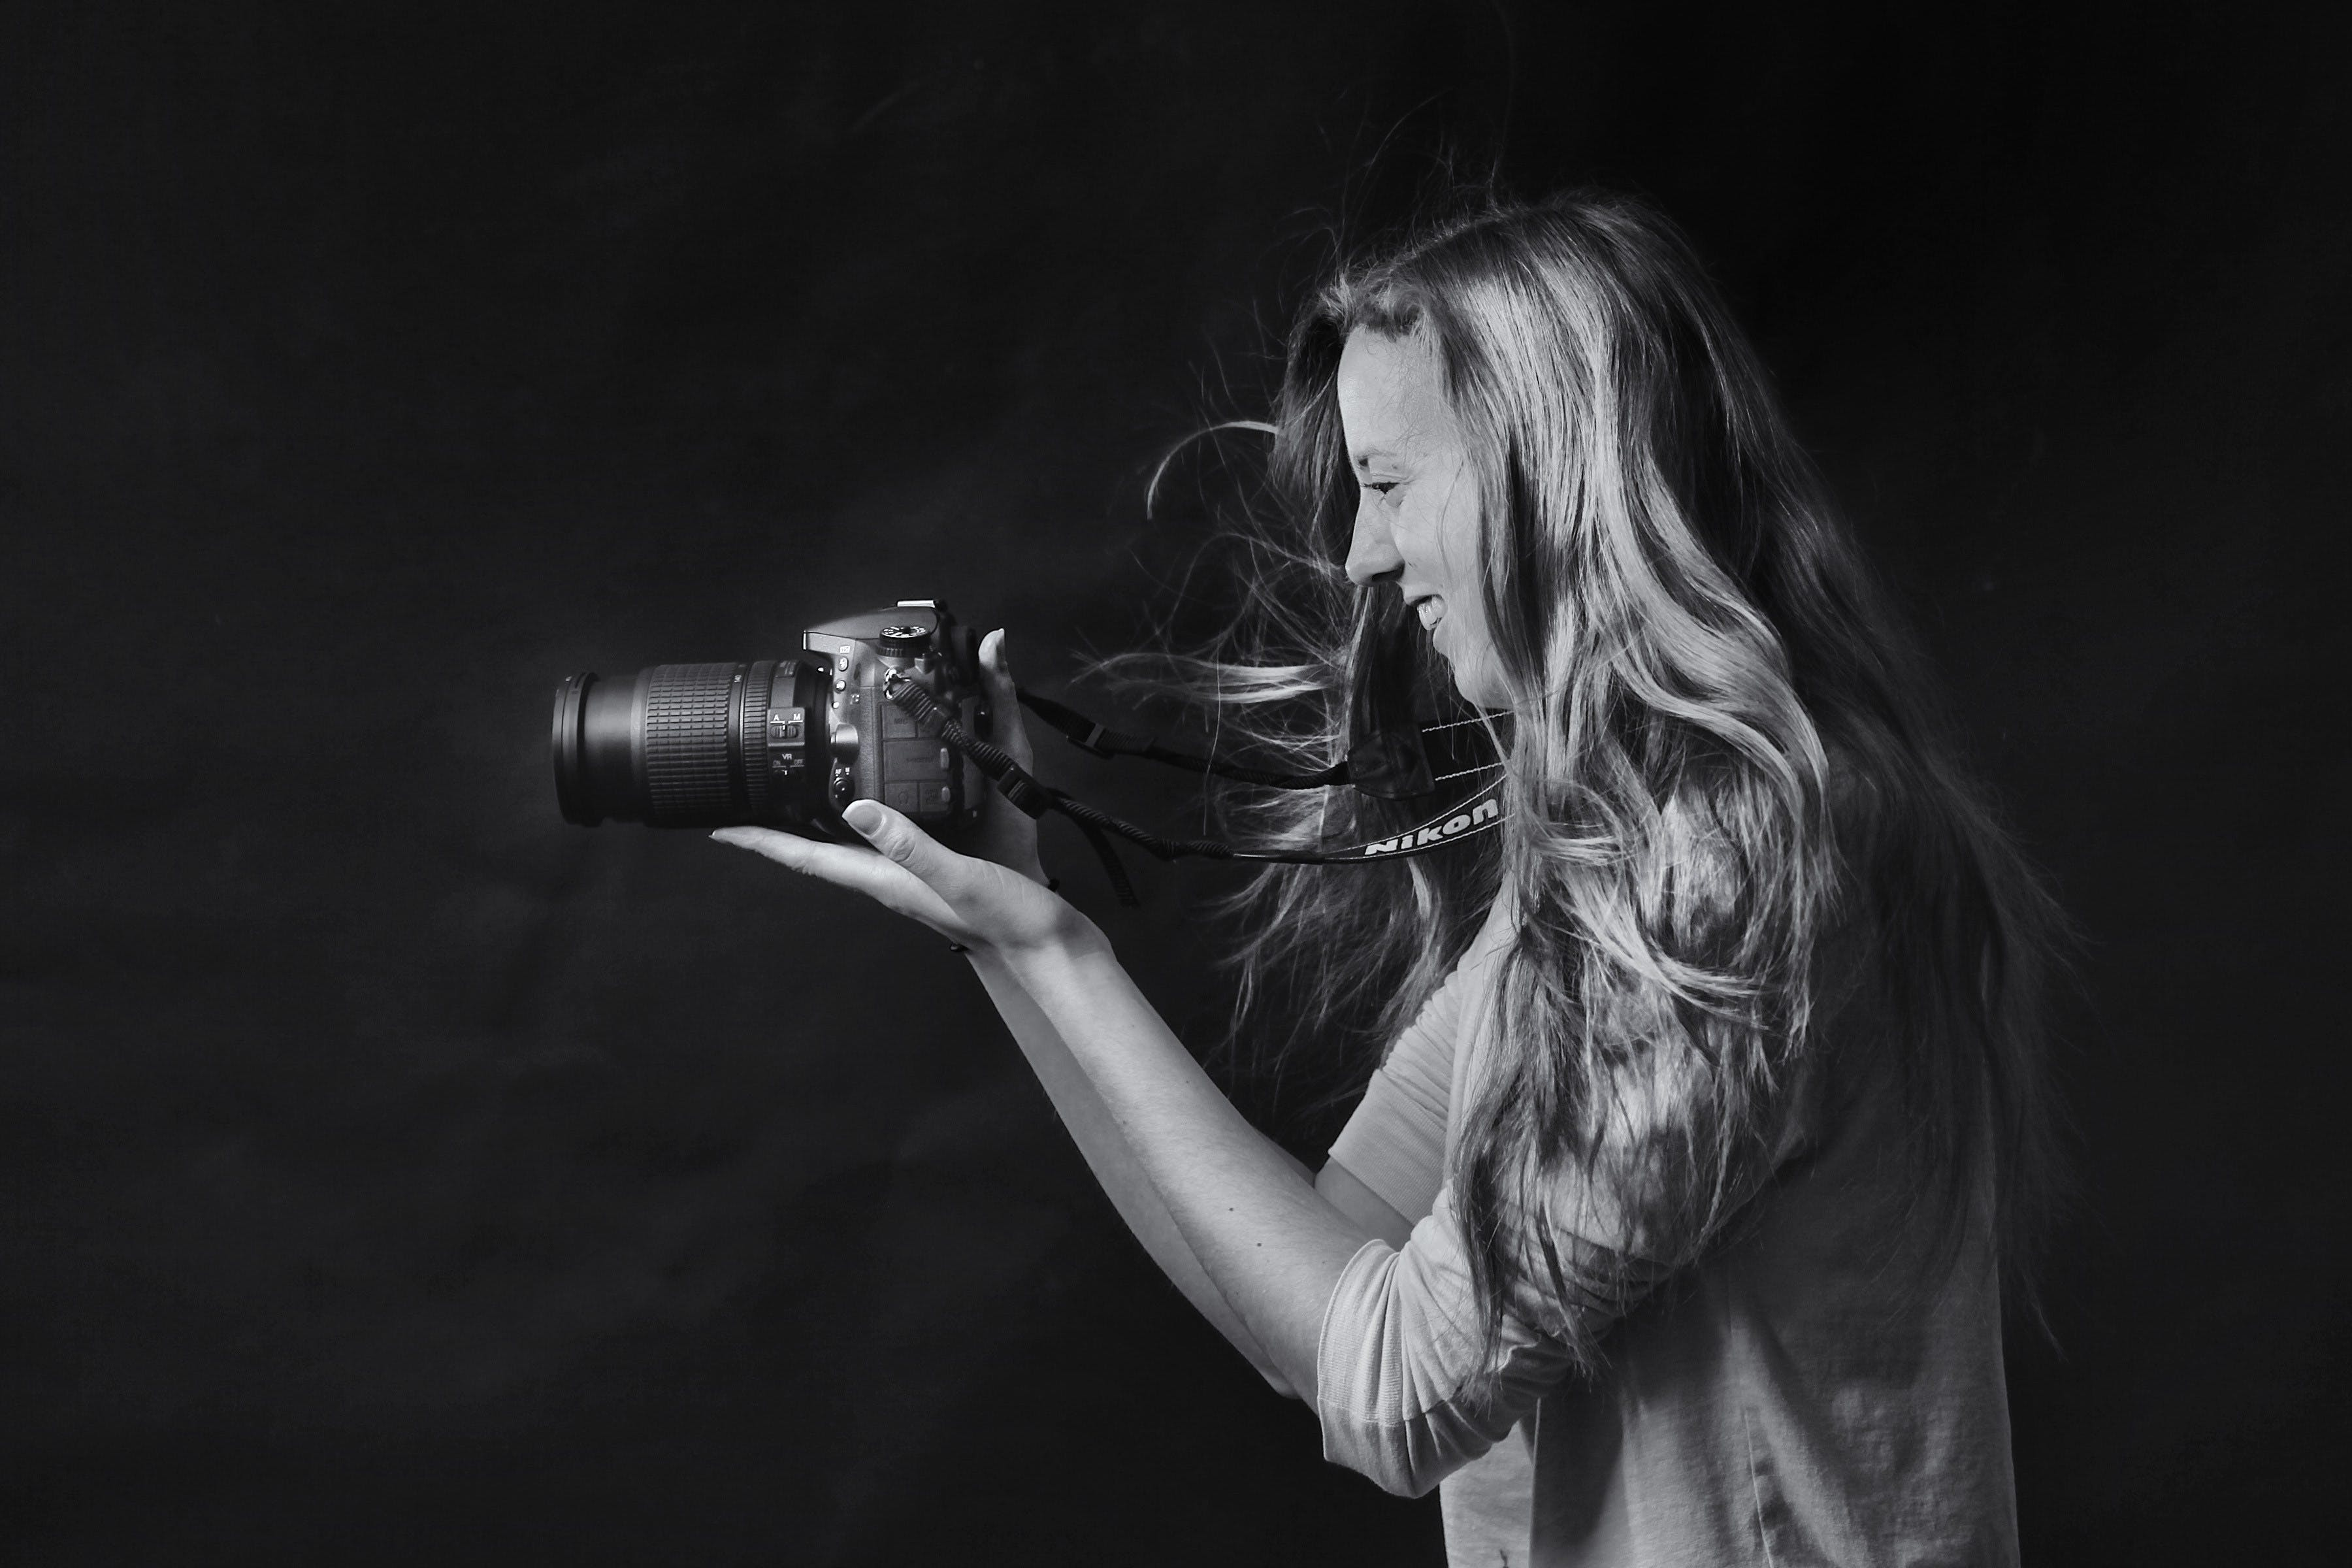 Grayscale Photo of Woman Using Dslr Camera